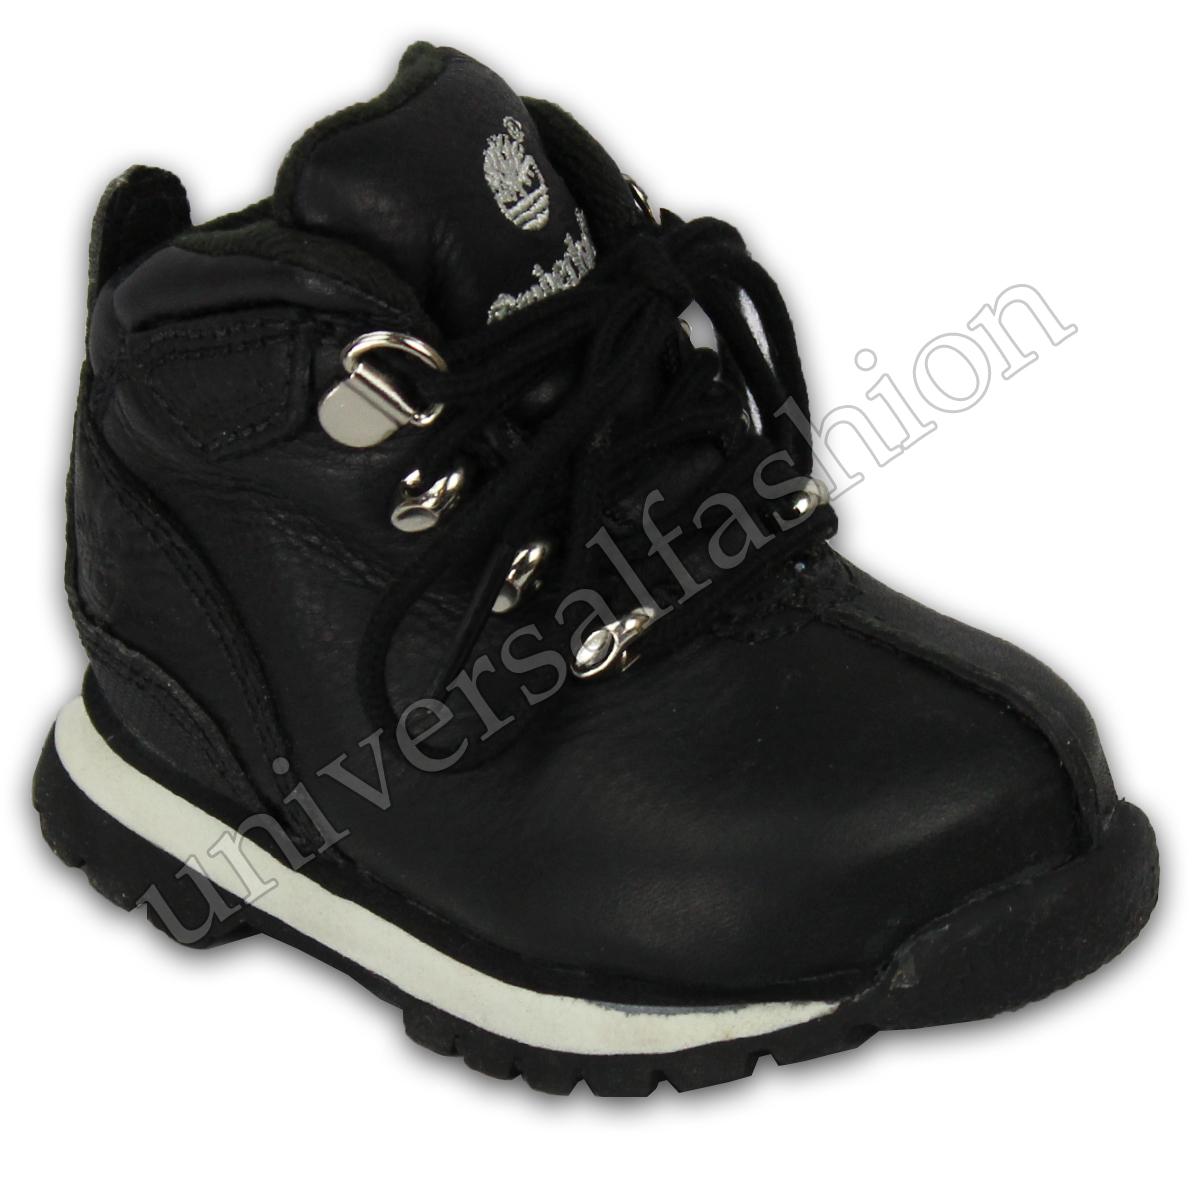 Chaussure bebe garcon pas cher - Chaussure kickers bebe pas cher ...